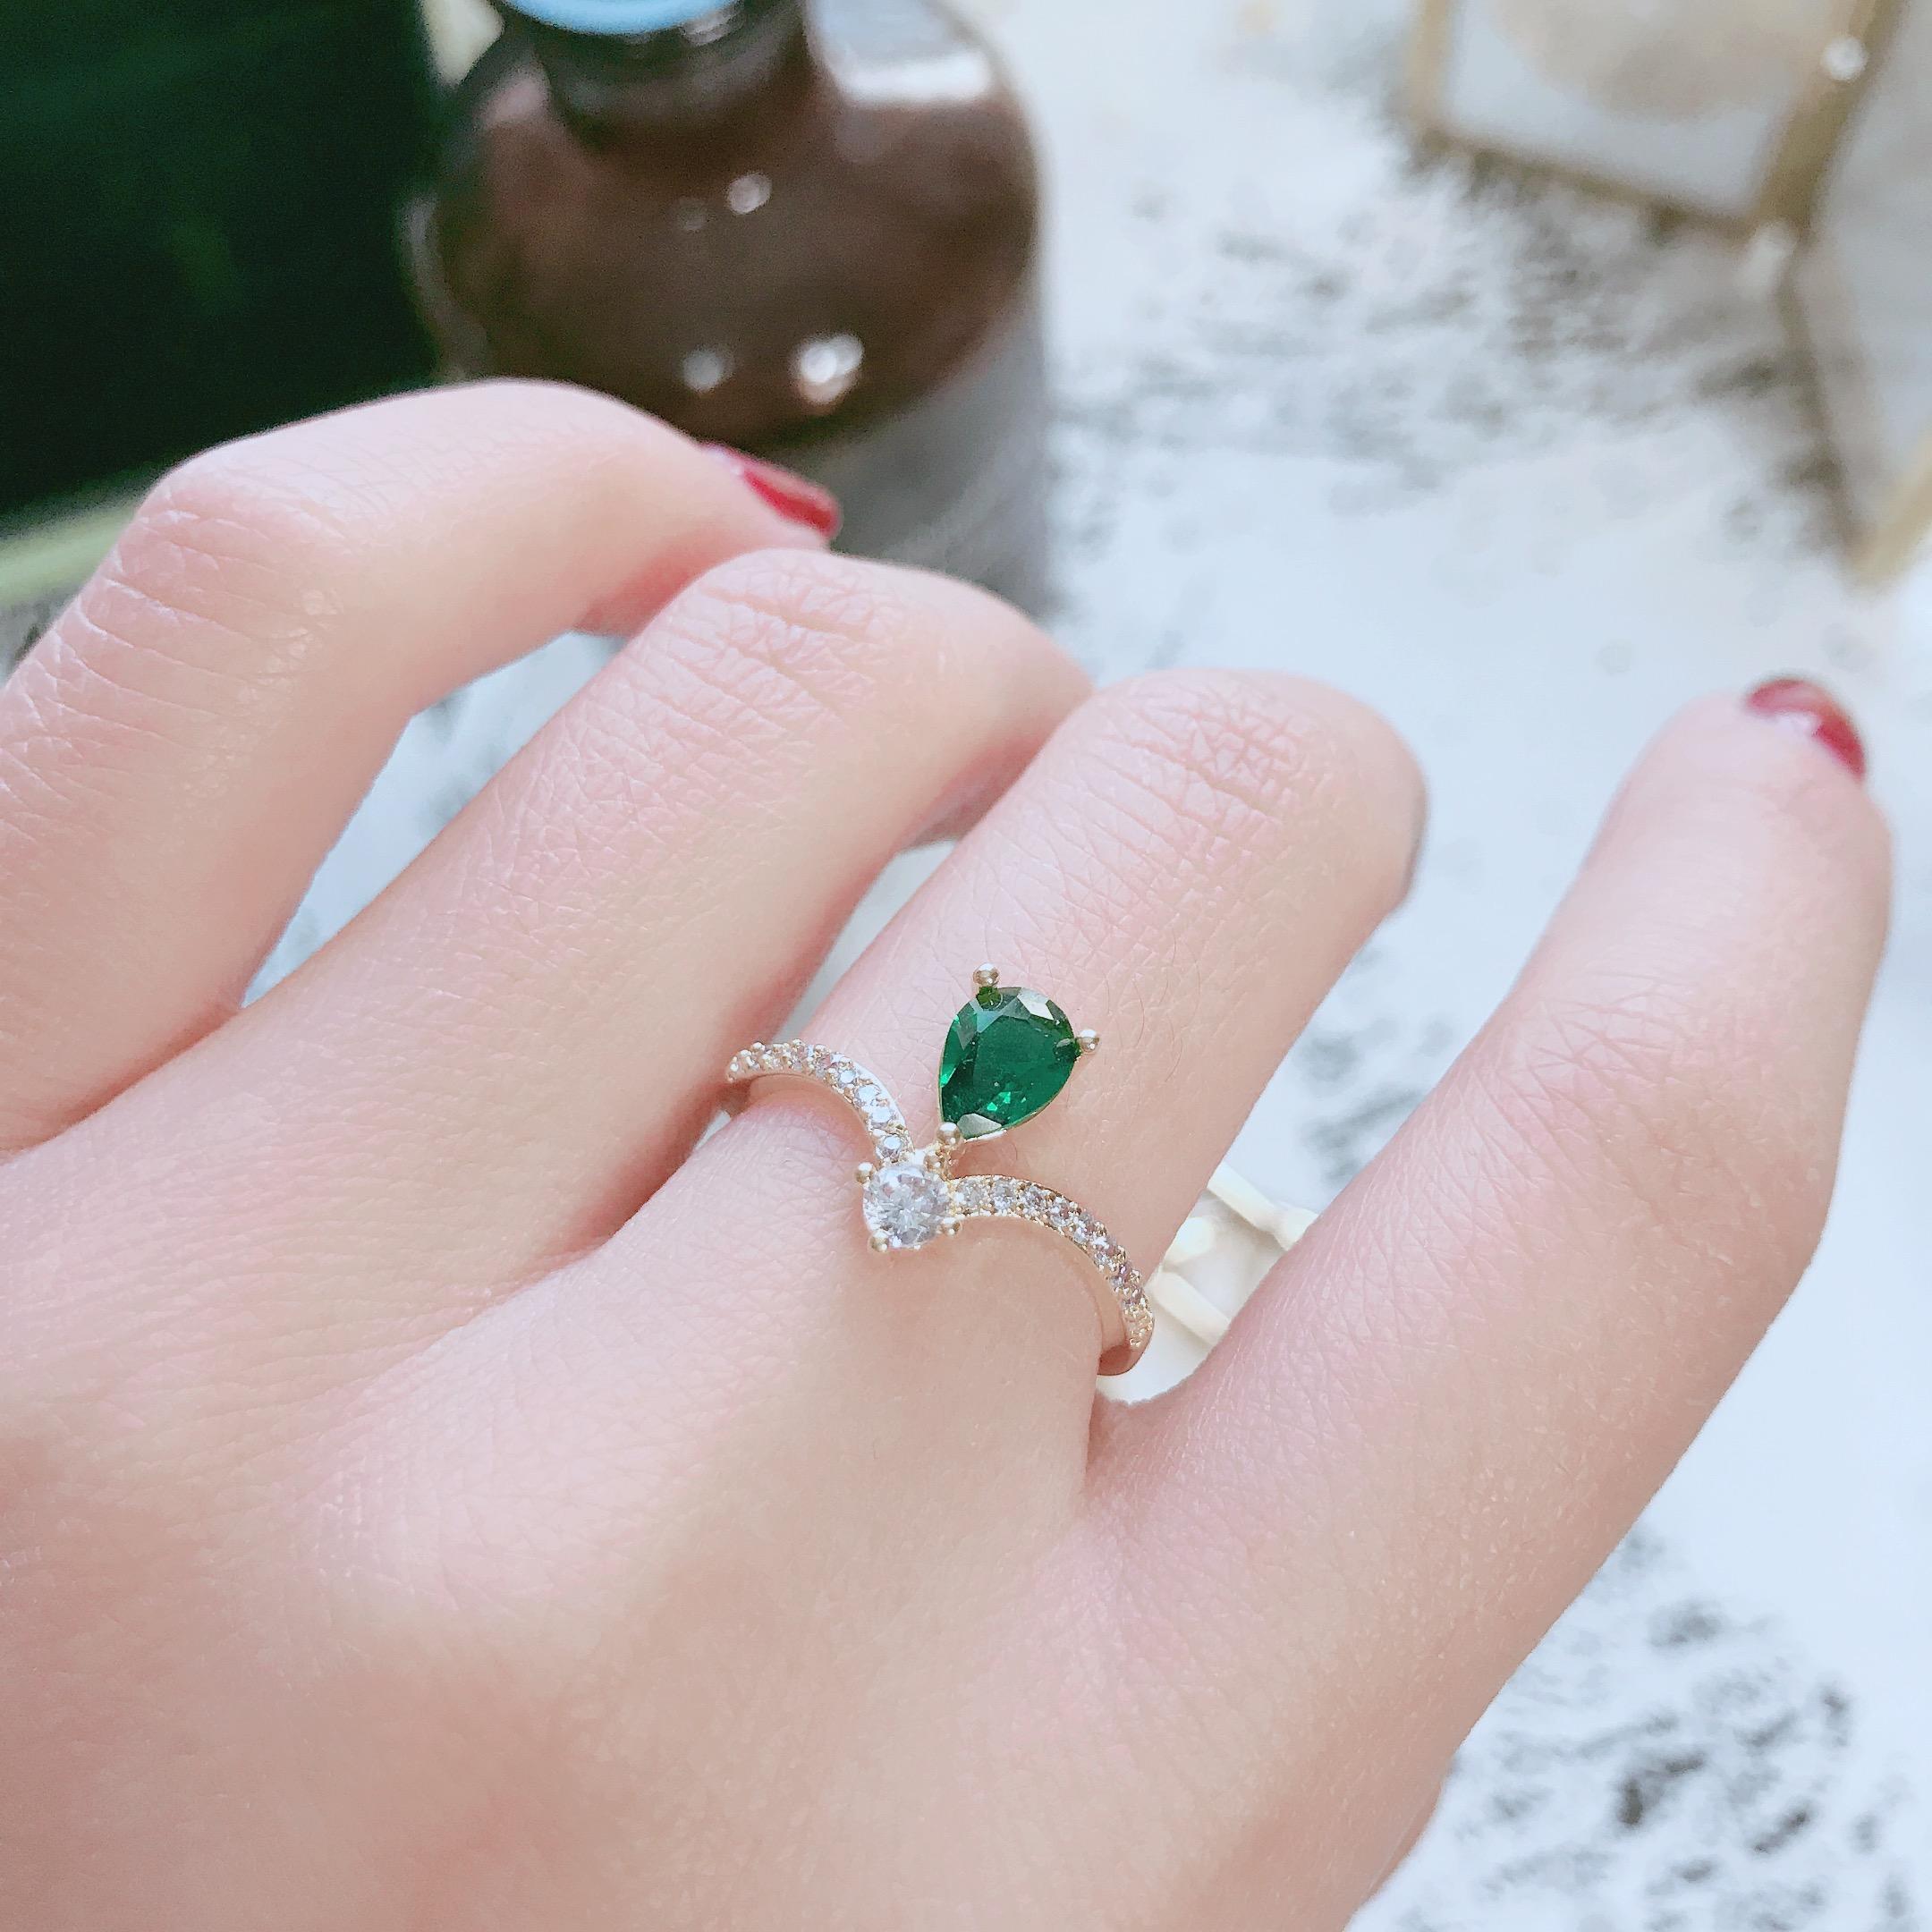 LN日系轻奢韩式ins少女祖母绿钻水滴皇冠中食指戒指女指环潮人学